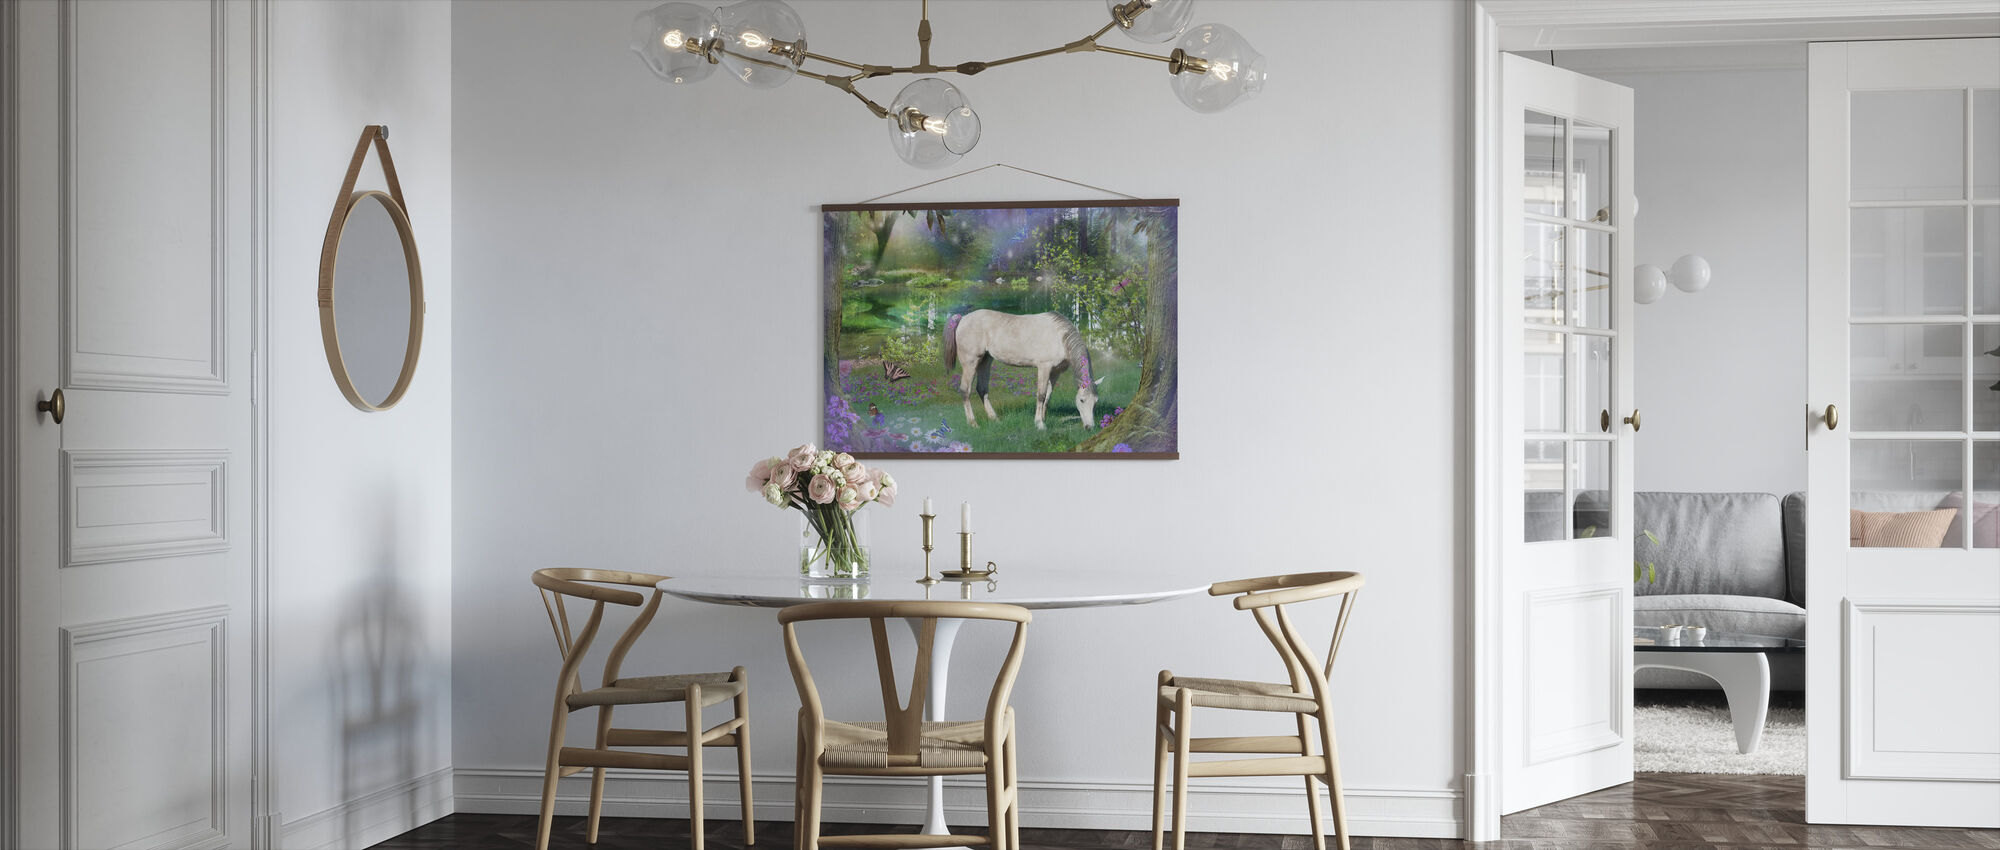 Emerald Unicorn - Poster - Kitchen